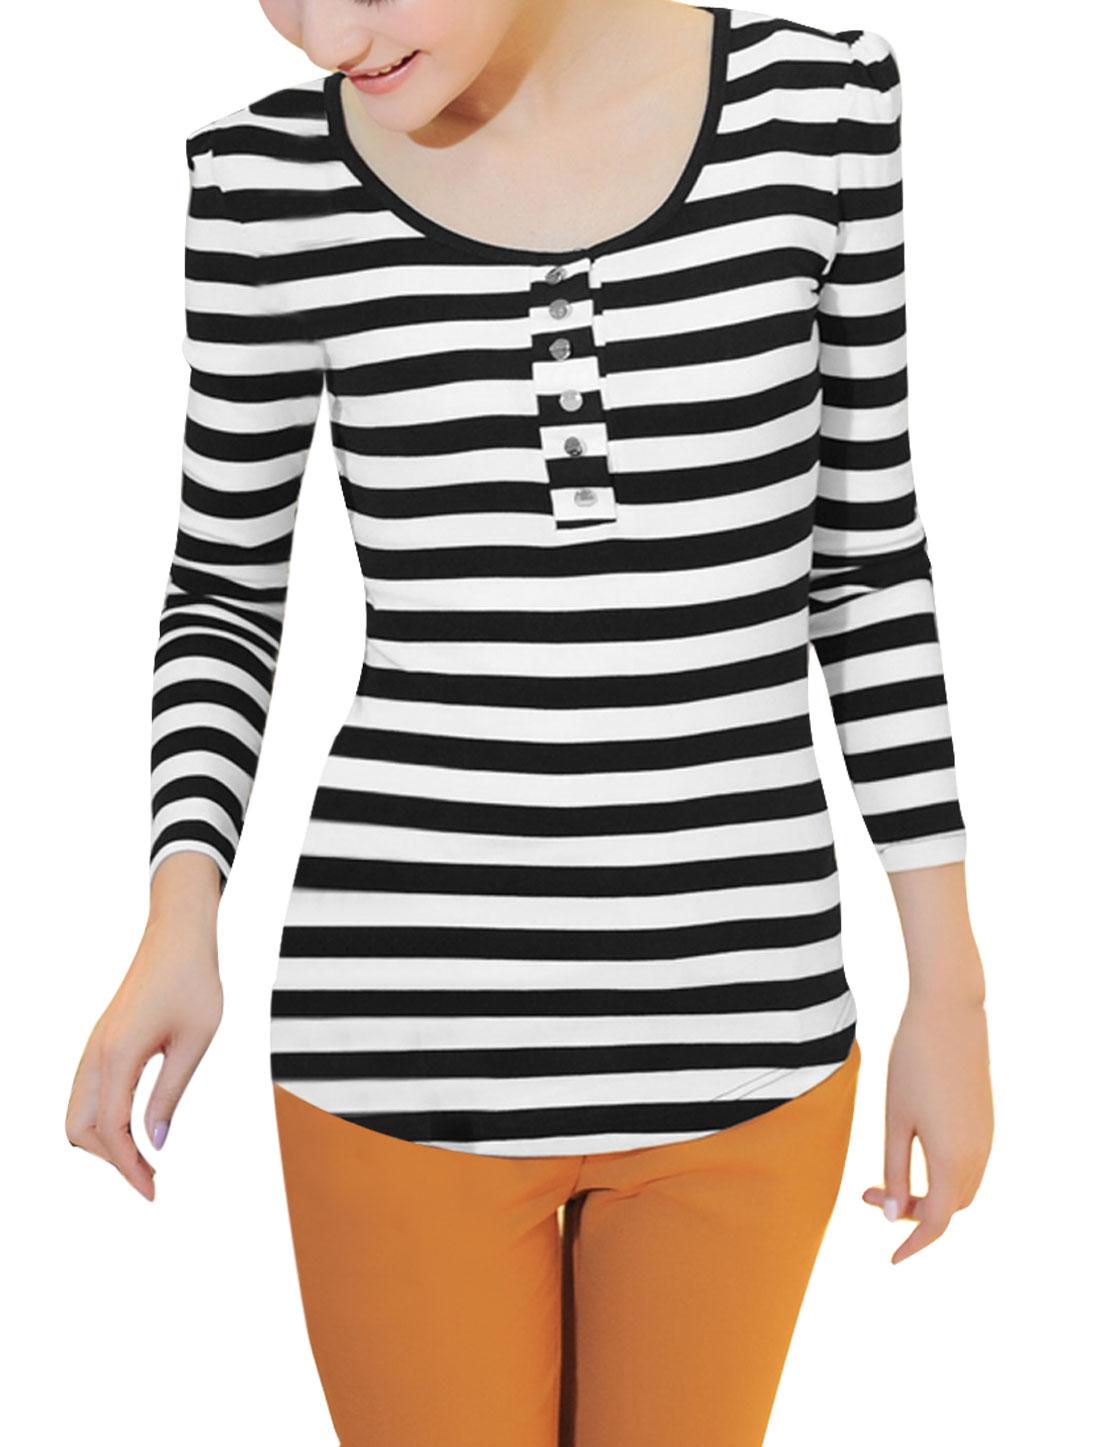 Woman Scoop Neck Crochet Lace Panel Back White Black Striped T-Shirt XS